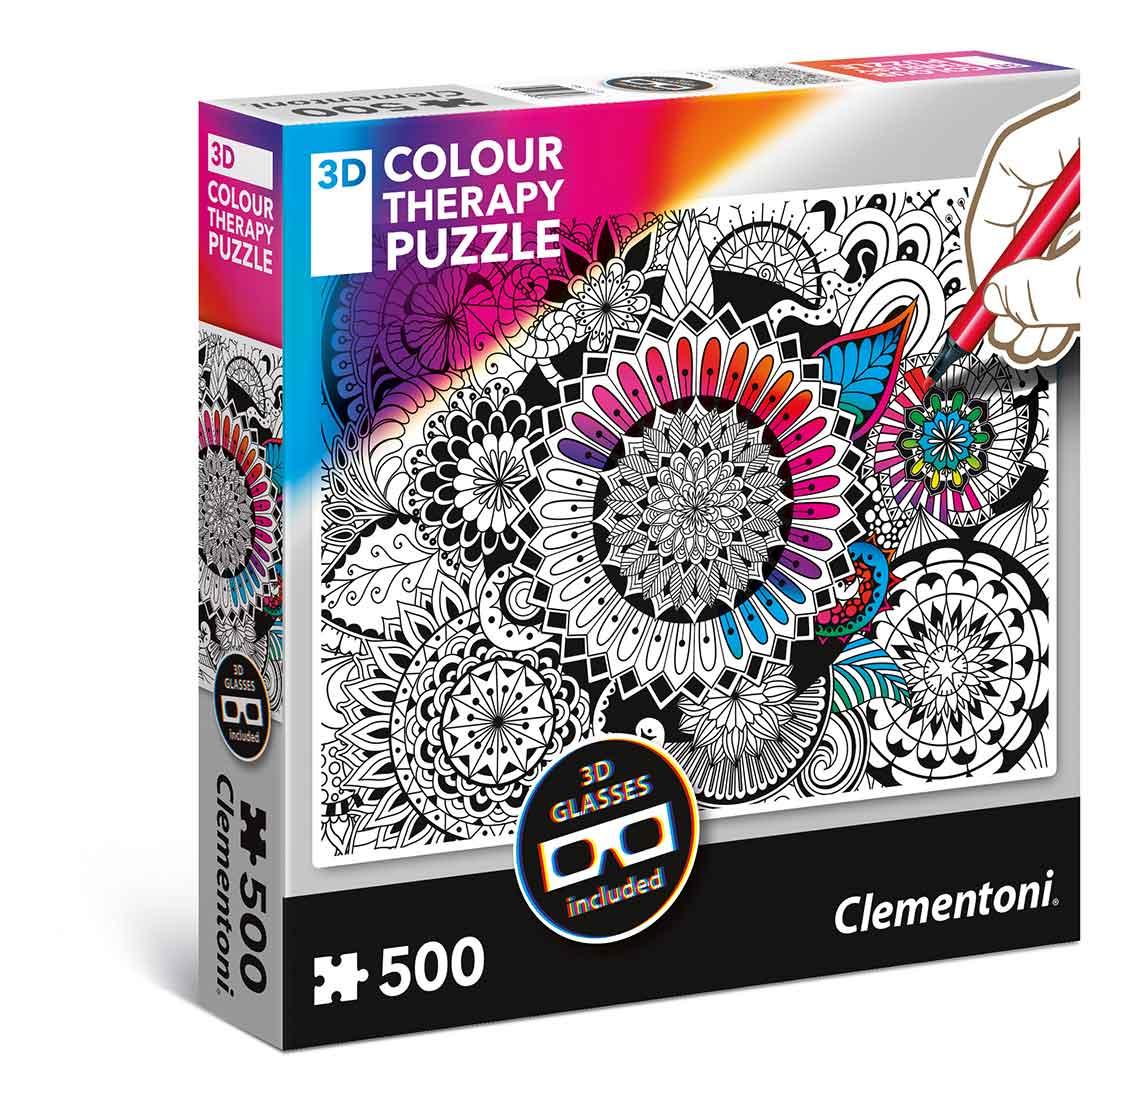 Puzzle Clementoni THERAPY Mandala de 500 Piezas